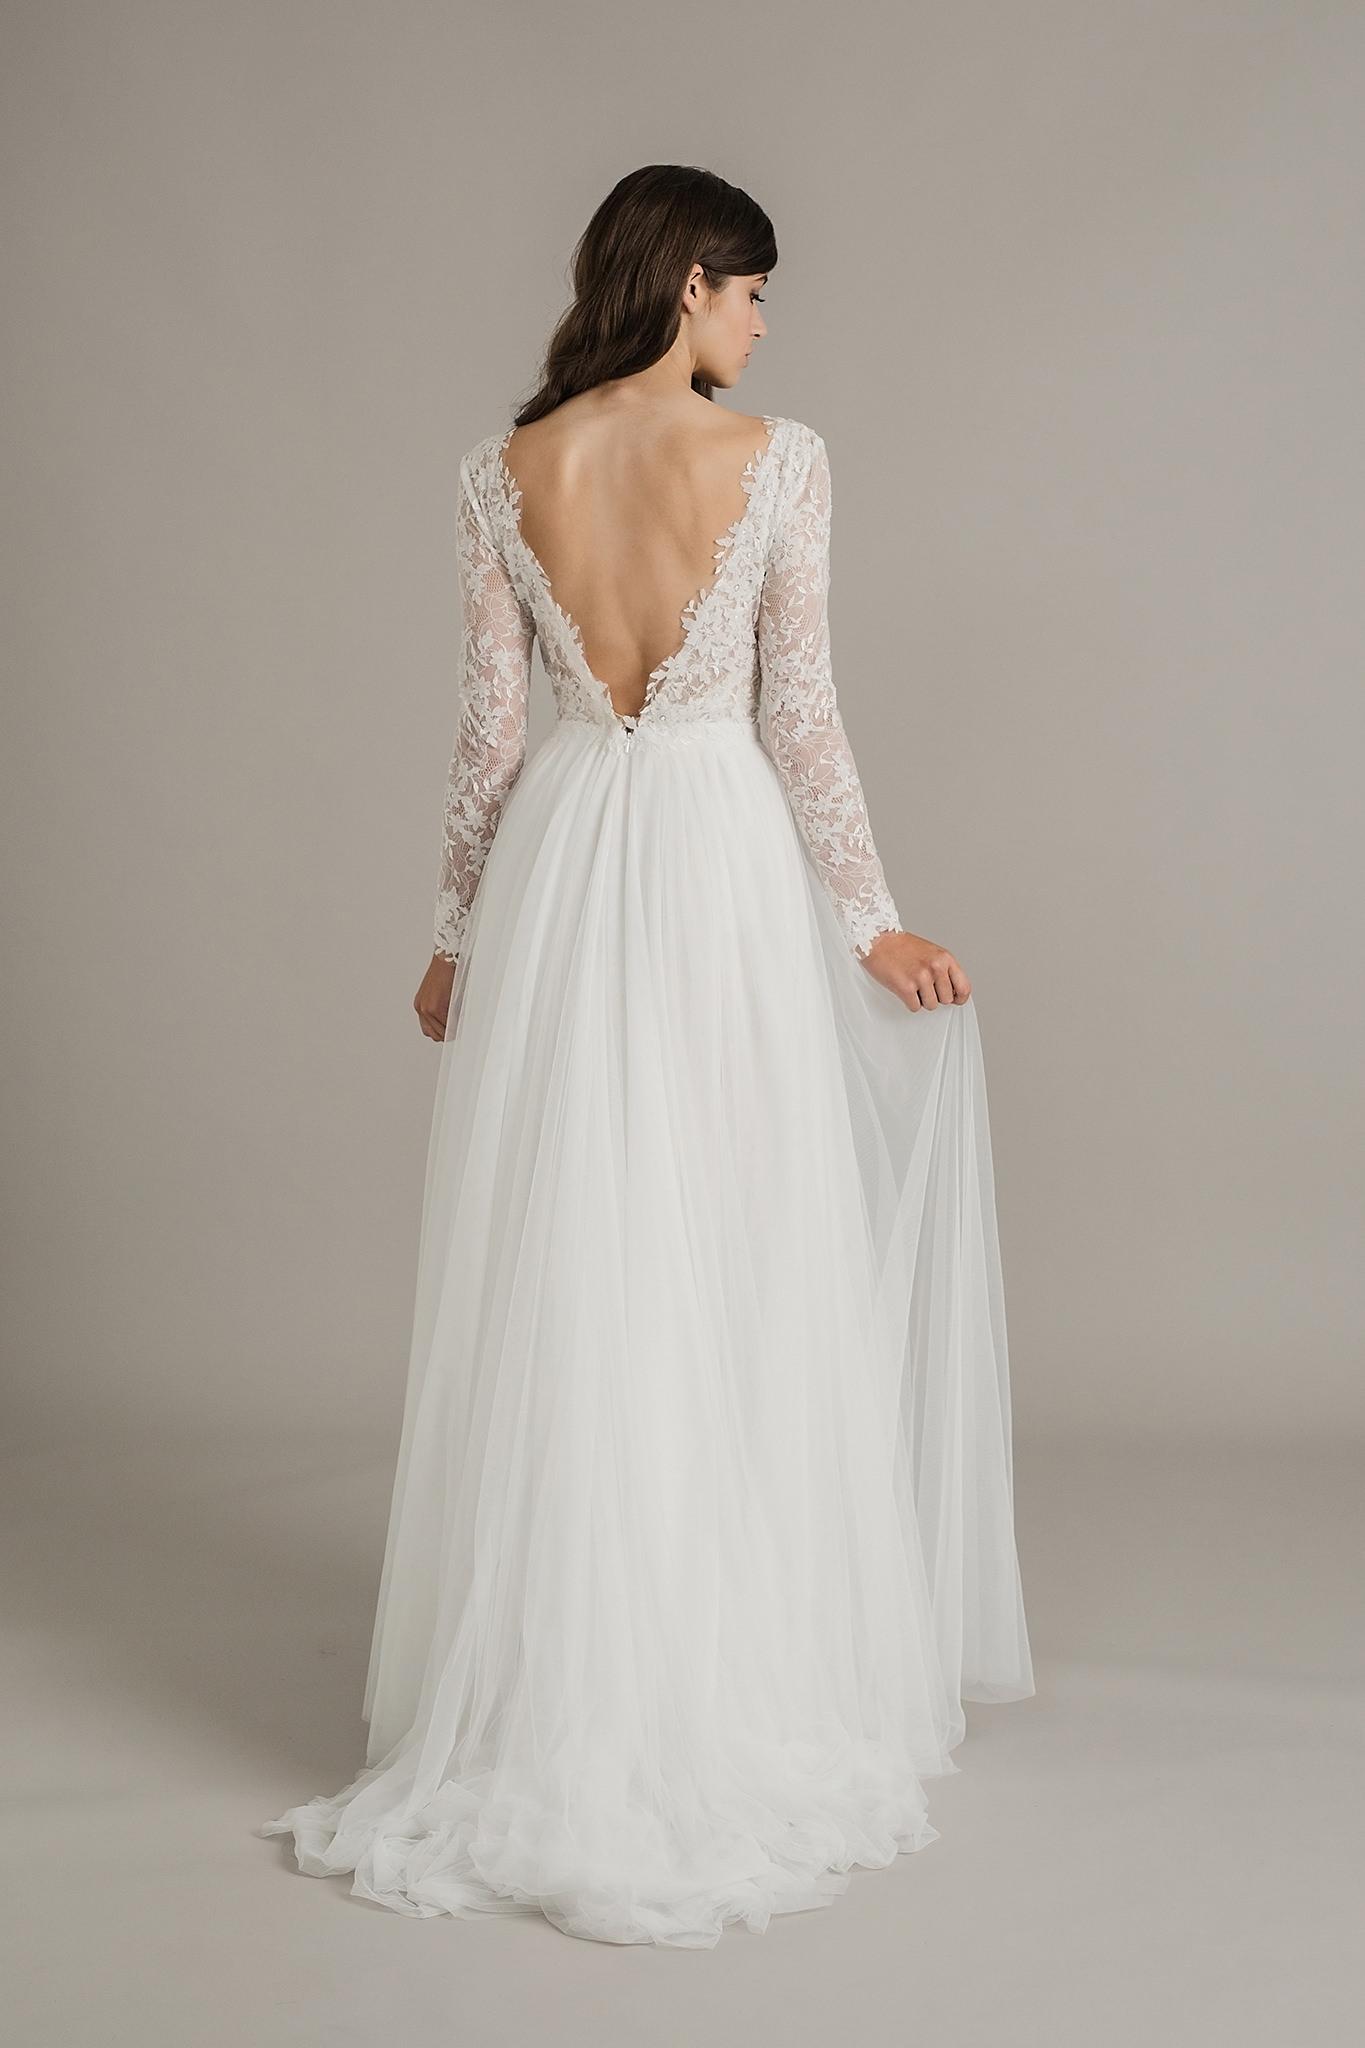 Genevieve wedding dress by Sally Eagle